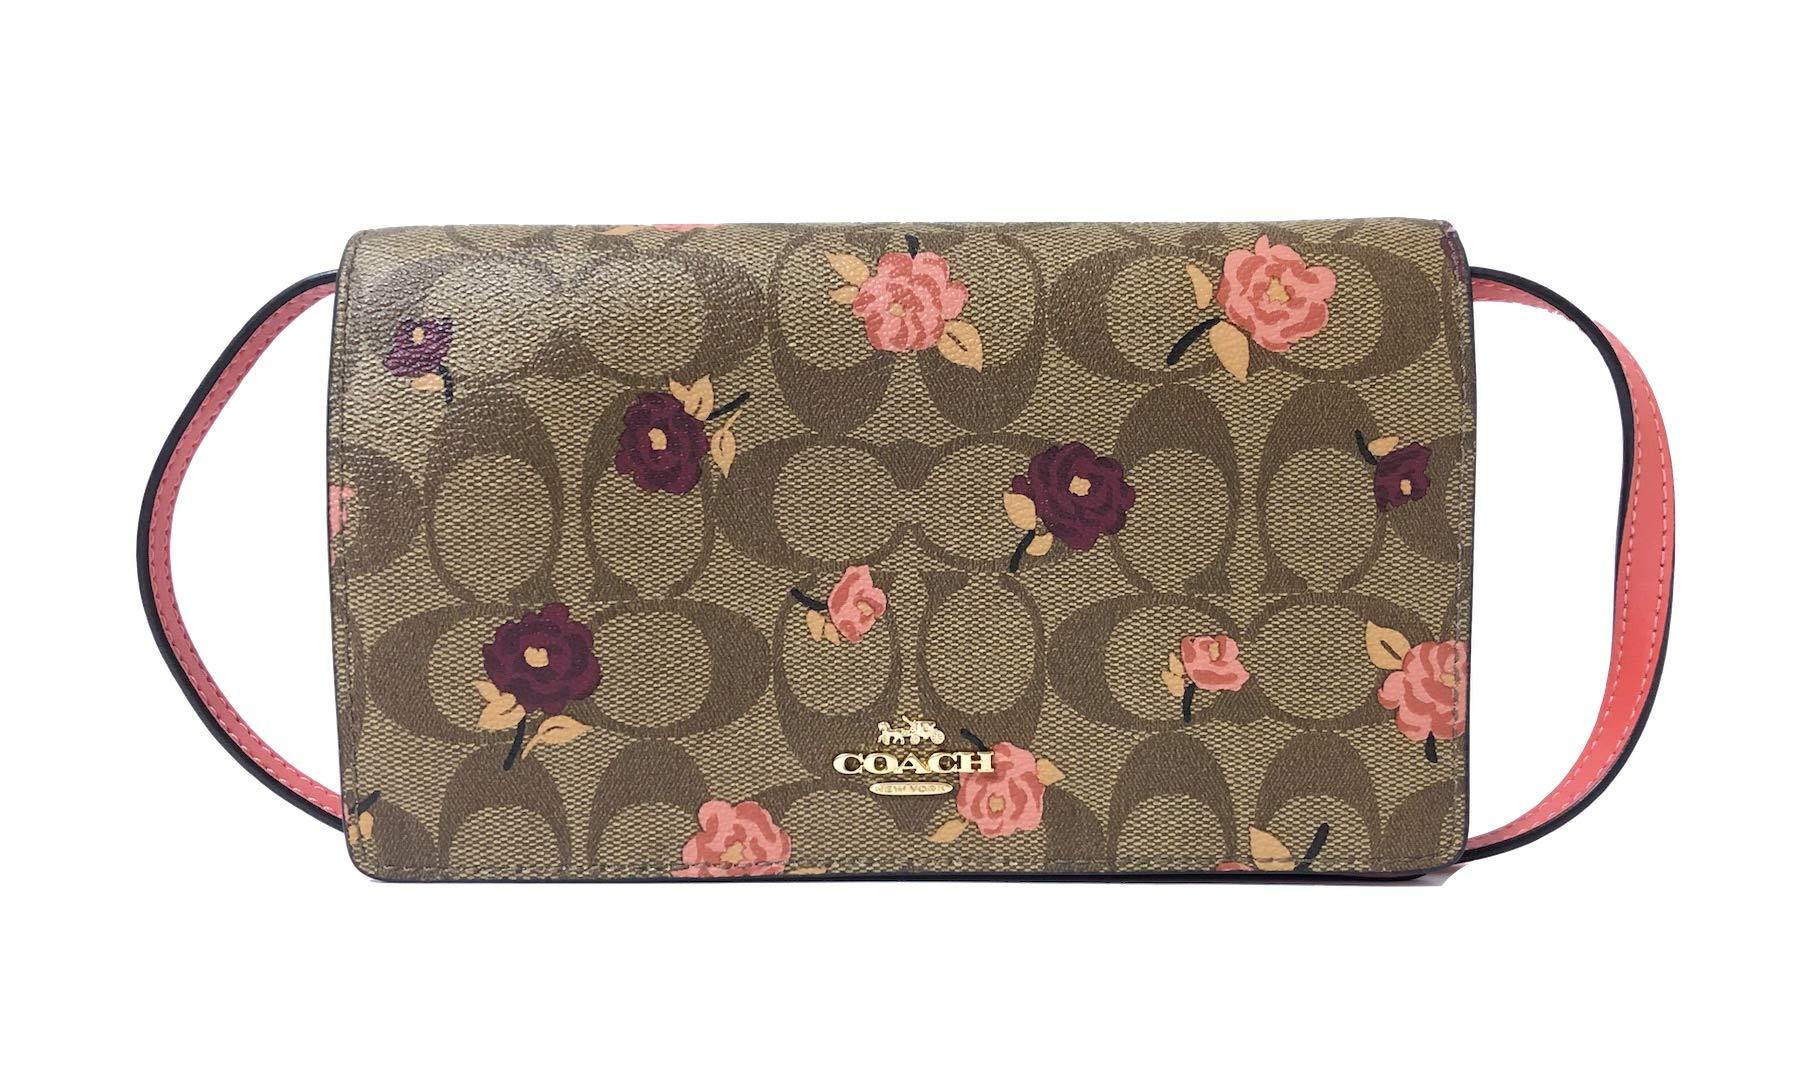 Coach Foldover Clutch Wallet Pebbled Leather Crossbody Bag F30256 (IM/Khaki Pink Multi)